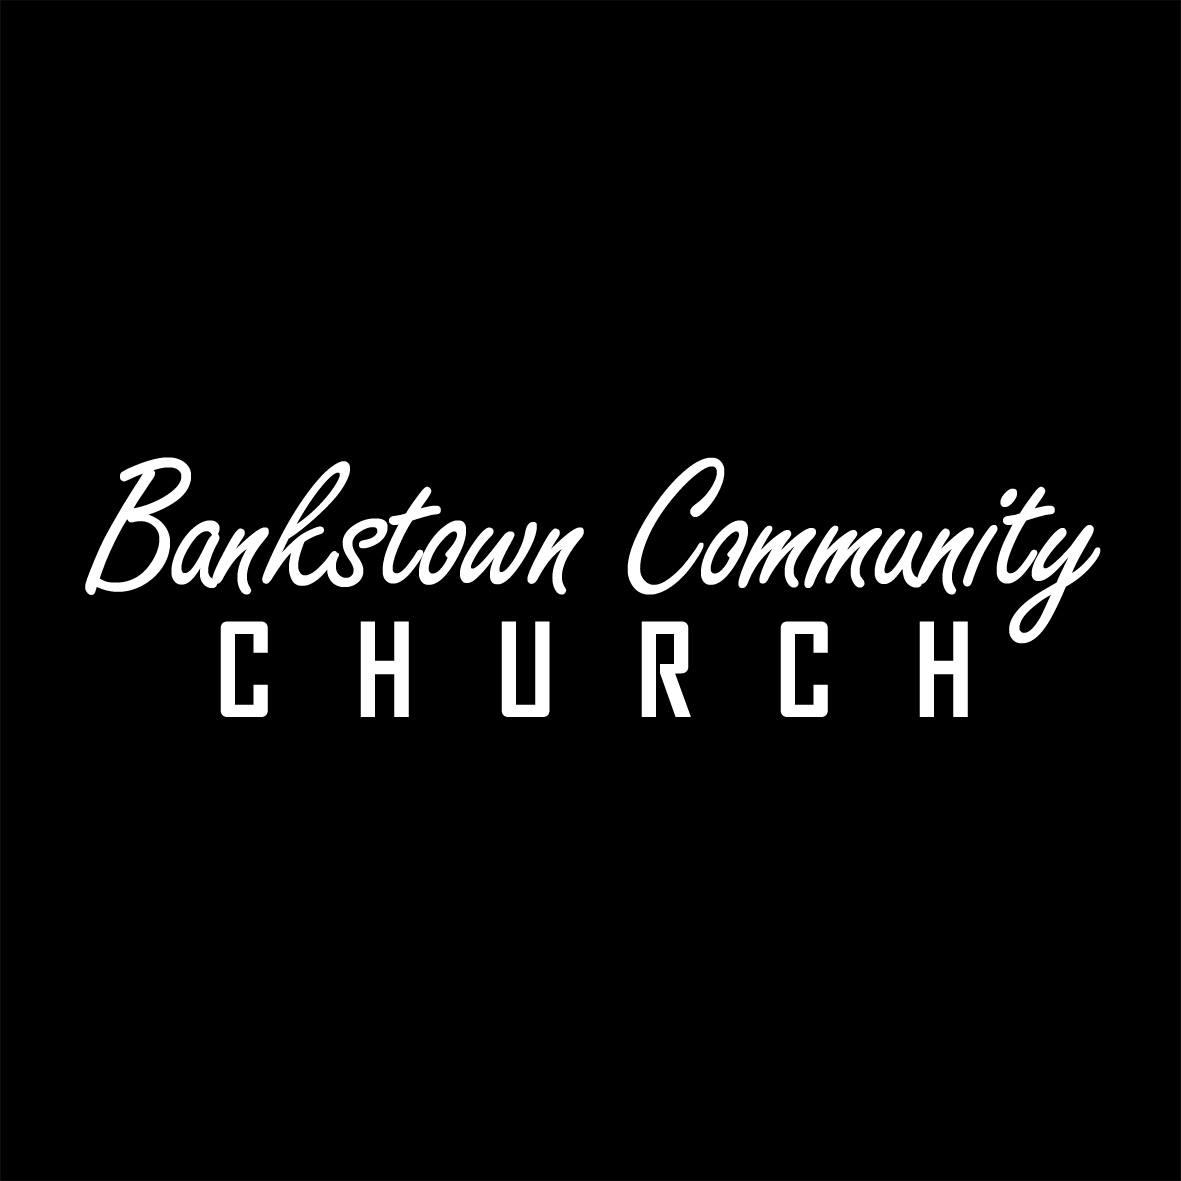 Bankstown Community Church